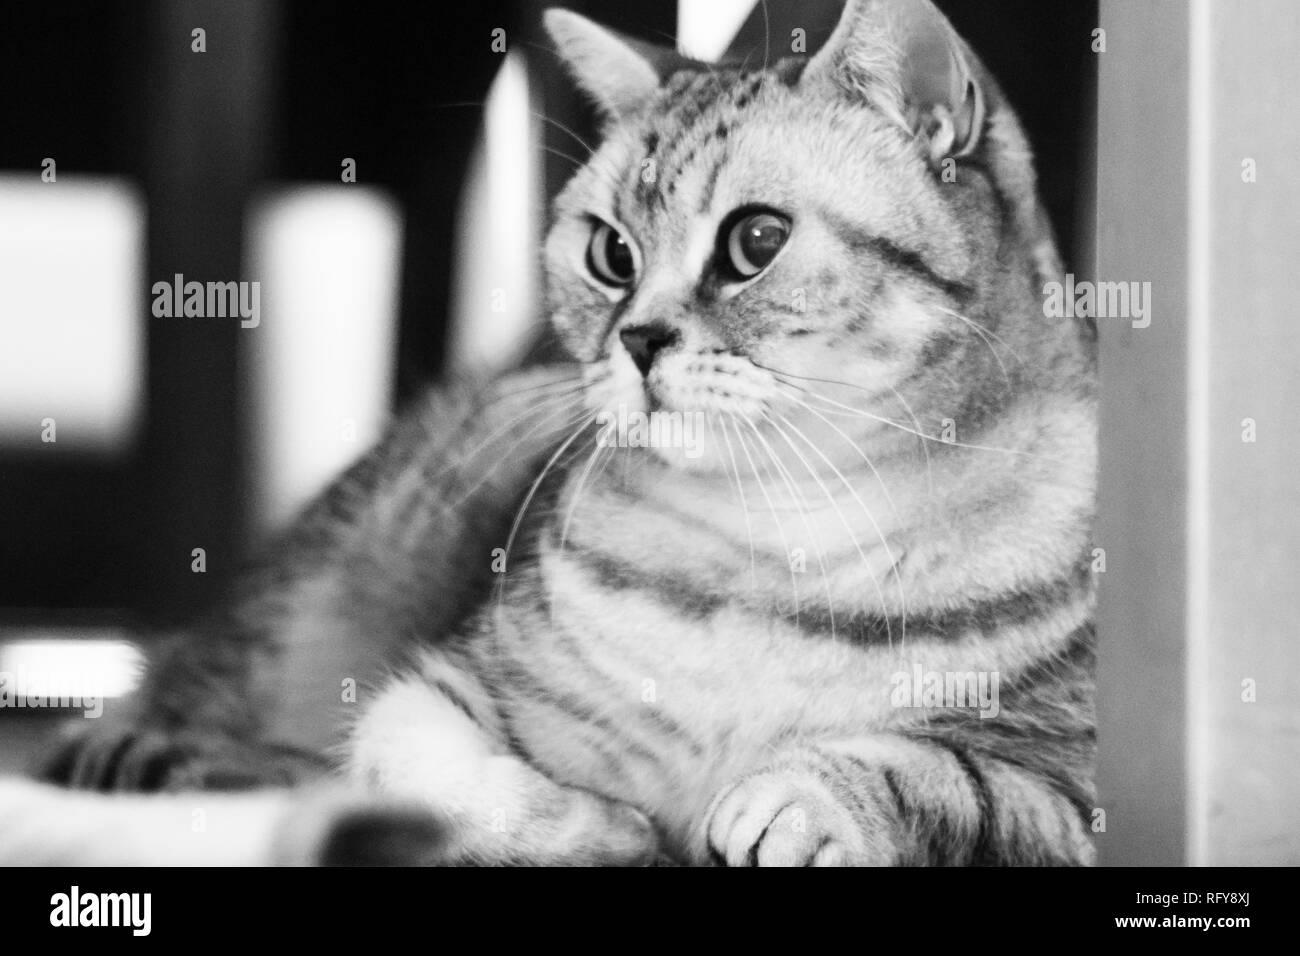 Katzen Portraits - Stock Image